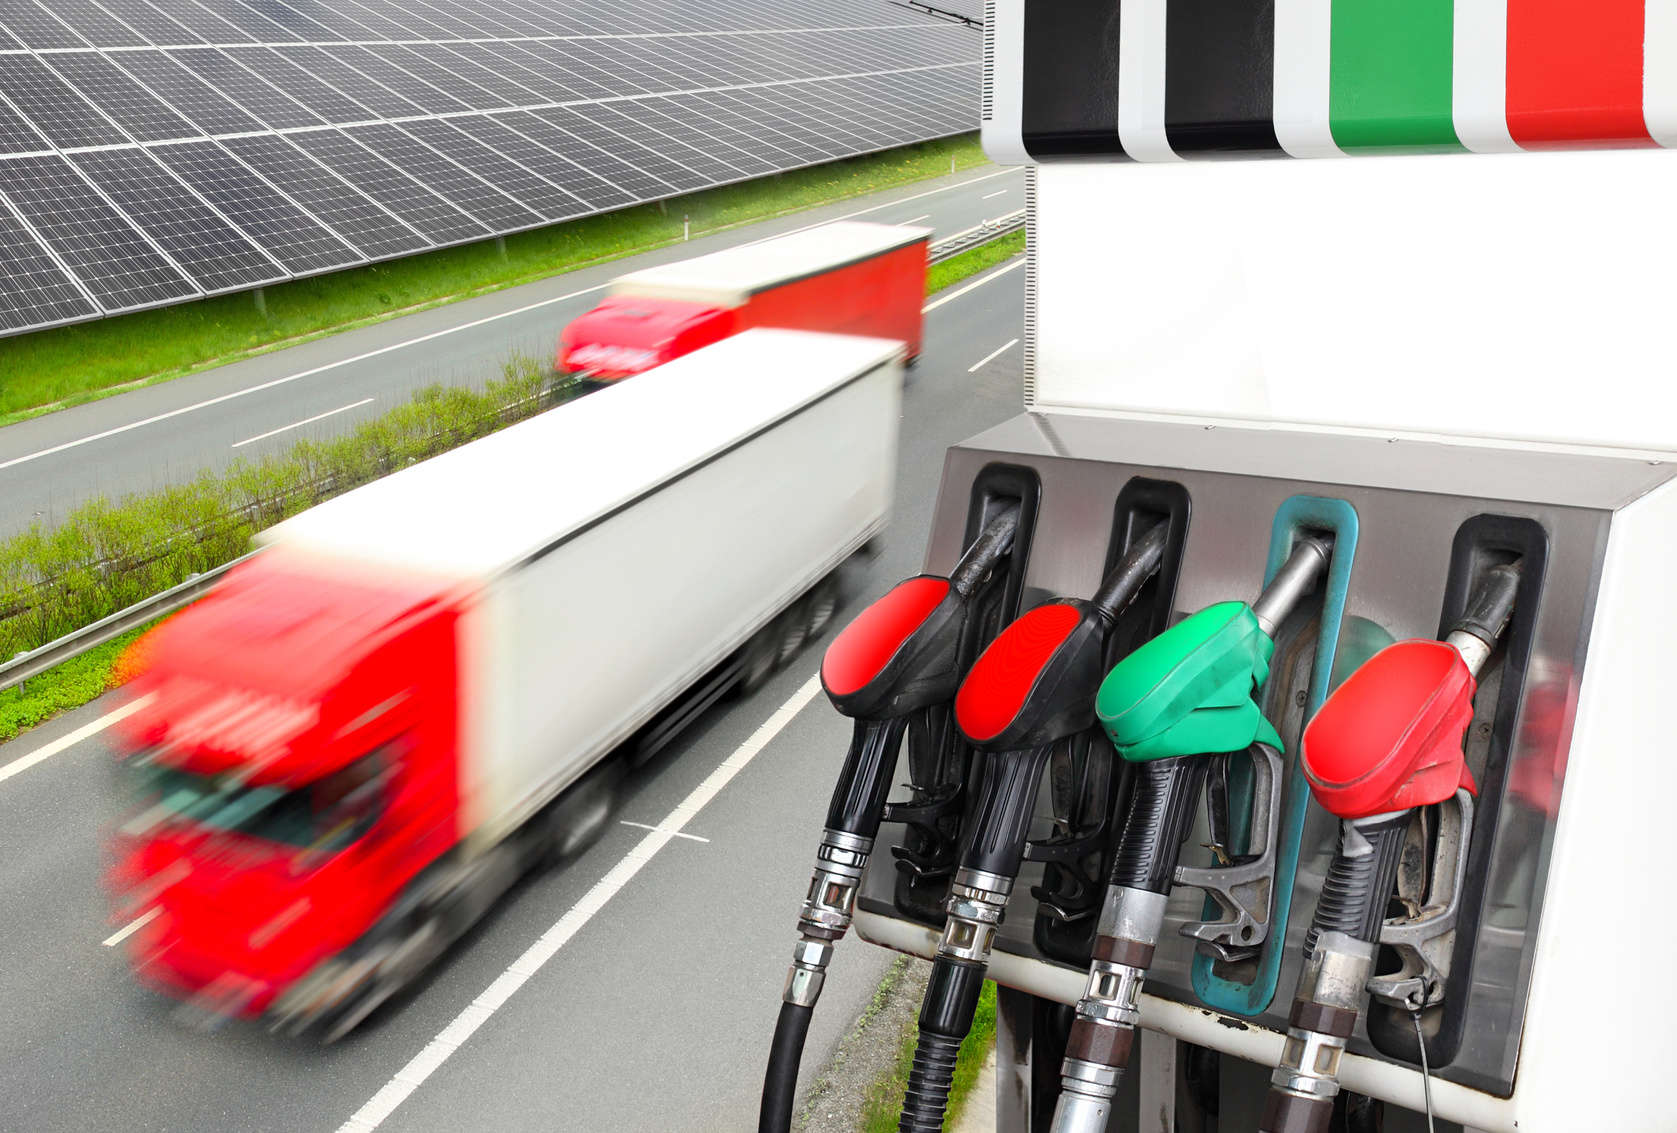 Fuel pumps and truck